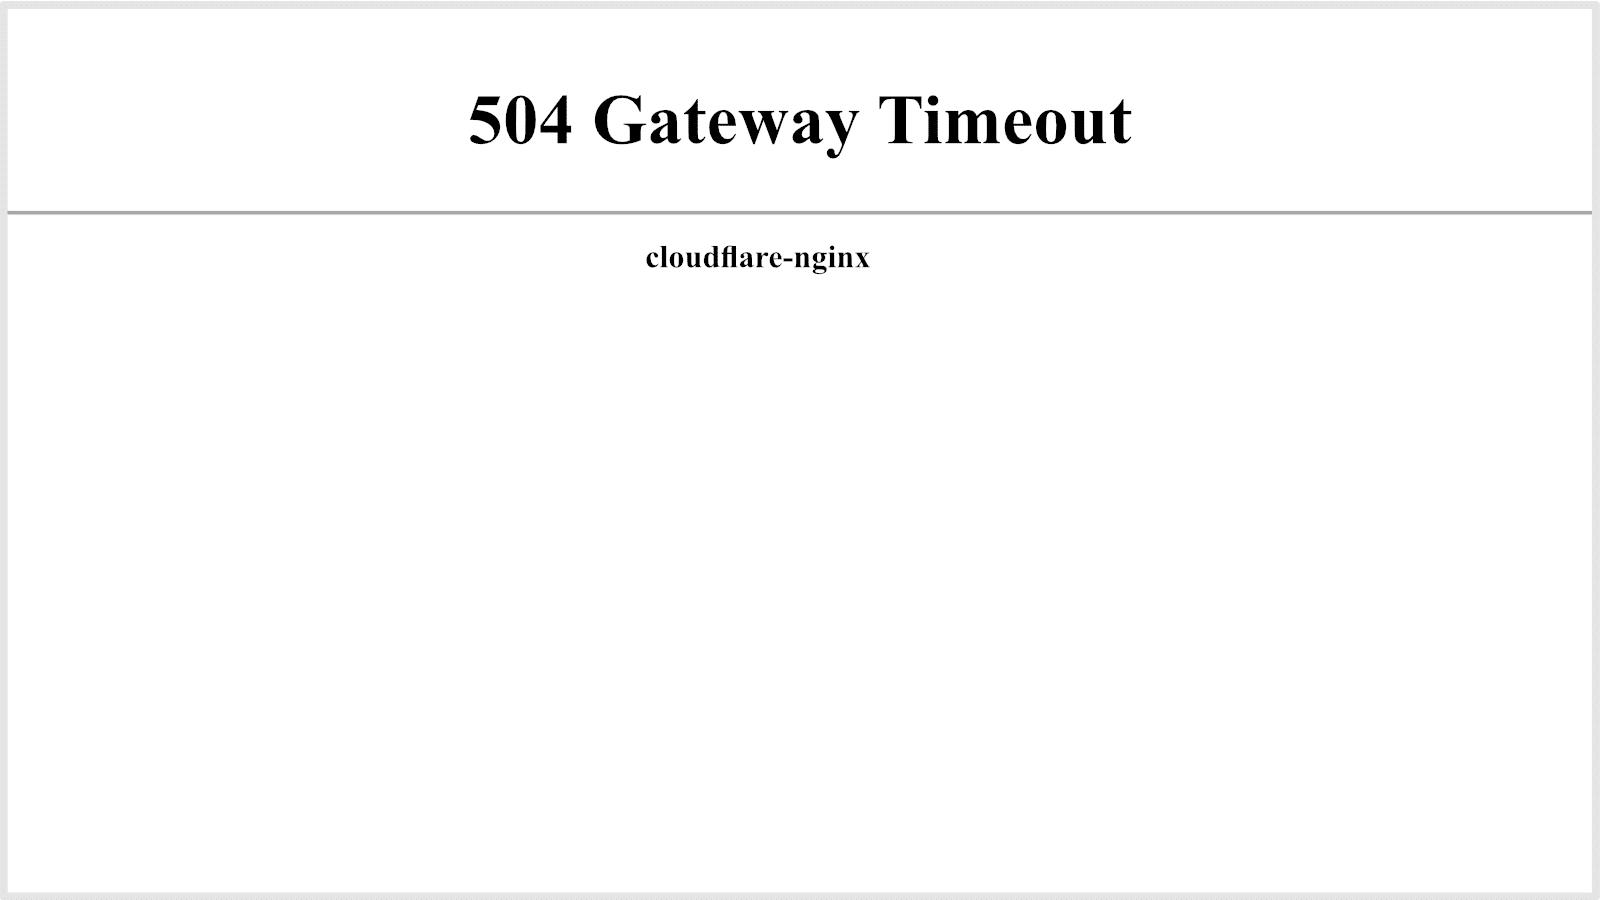 Cloudflare 504 gateway timeout